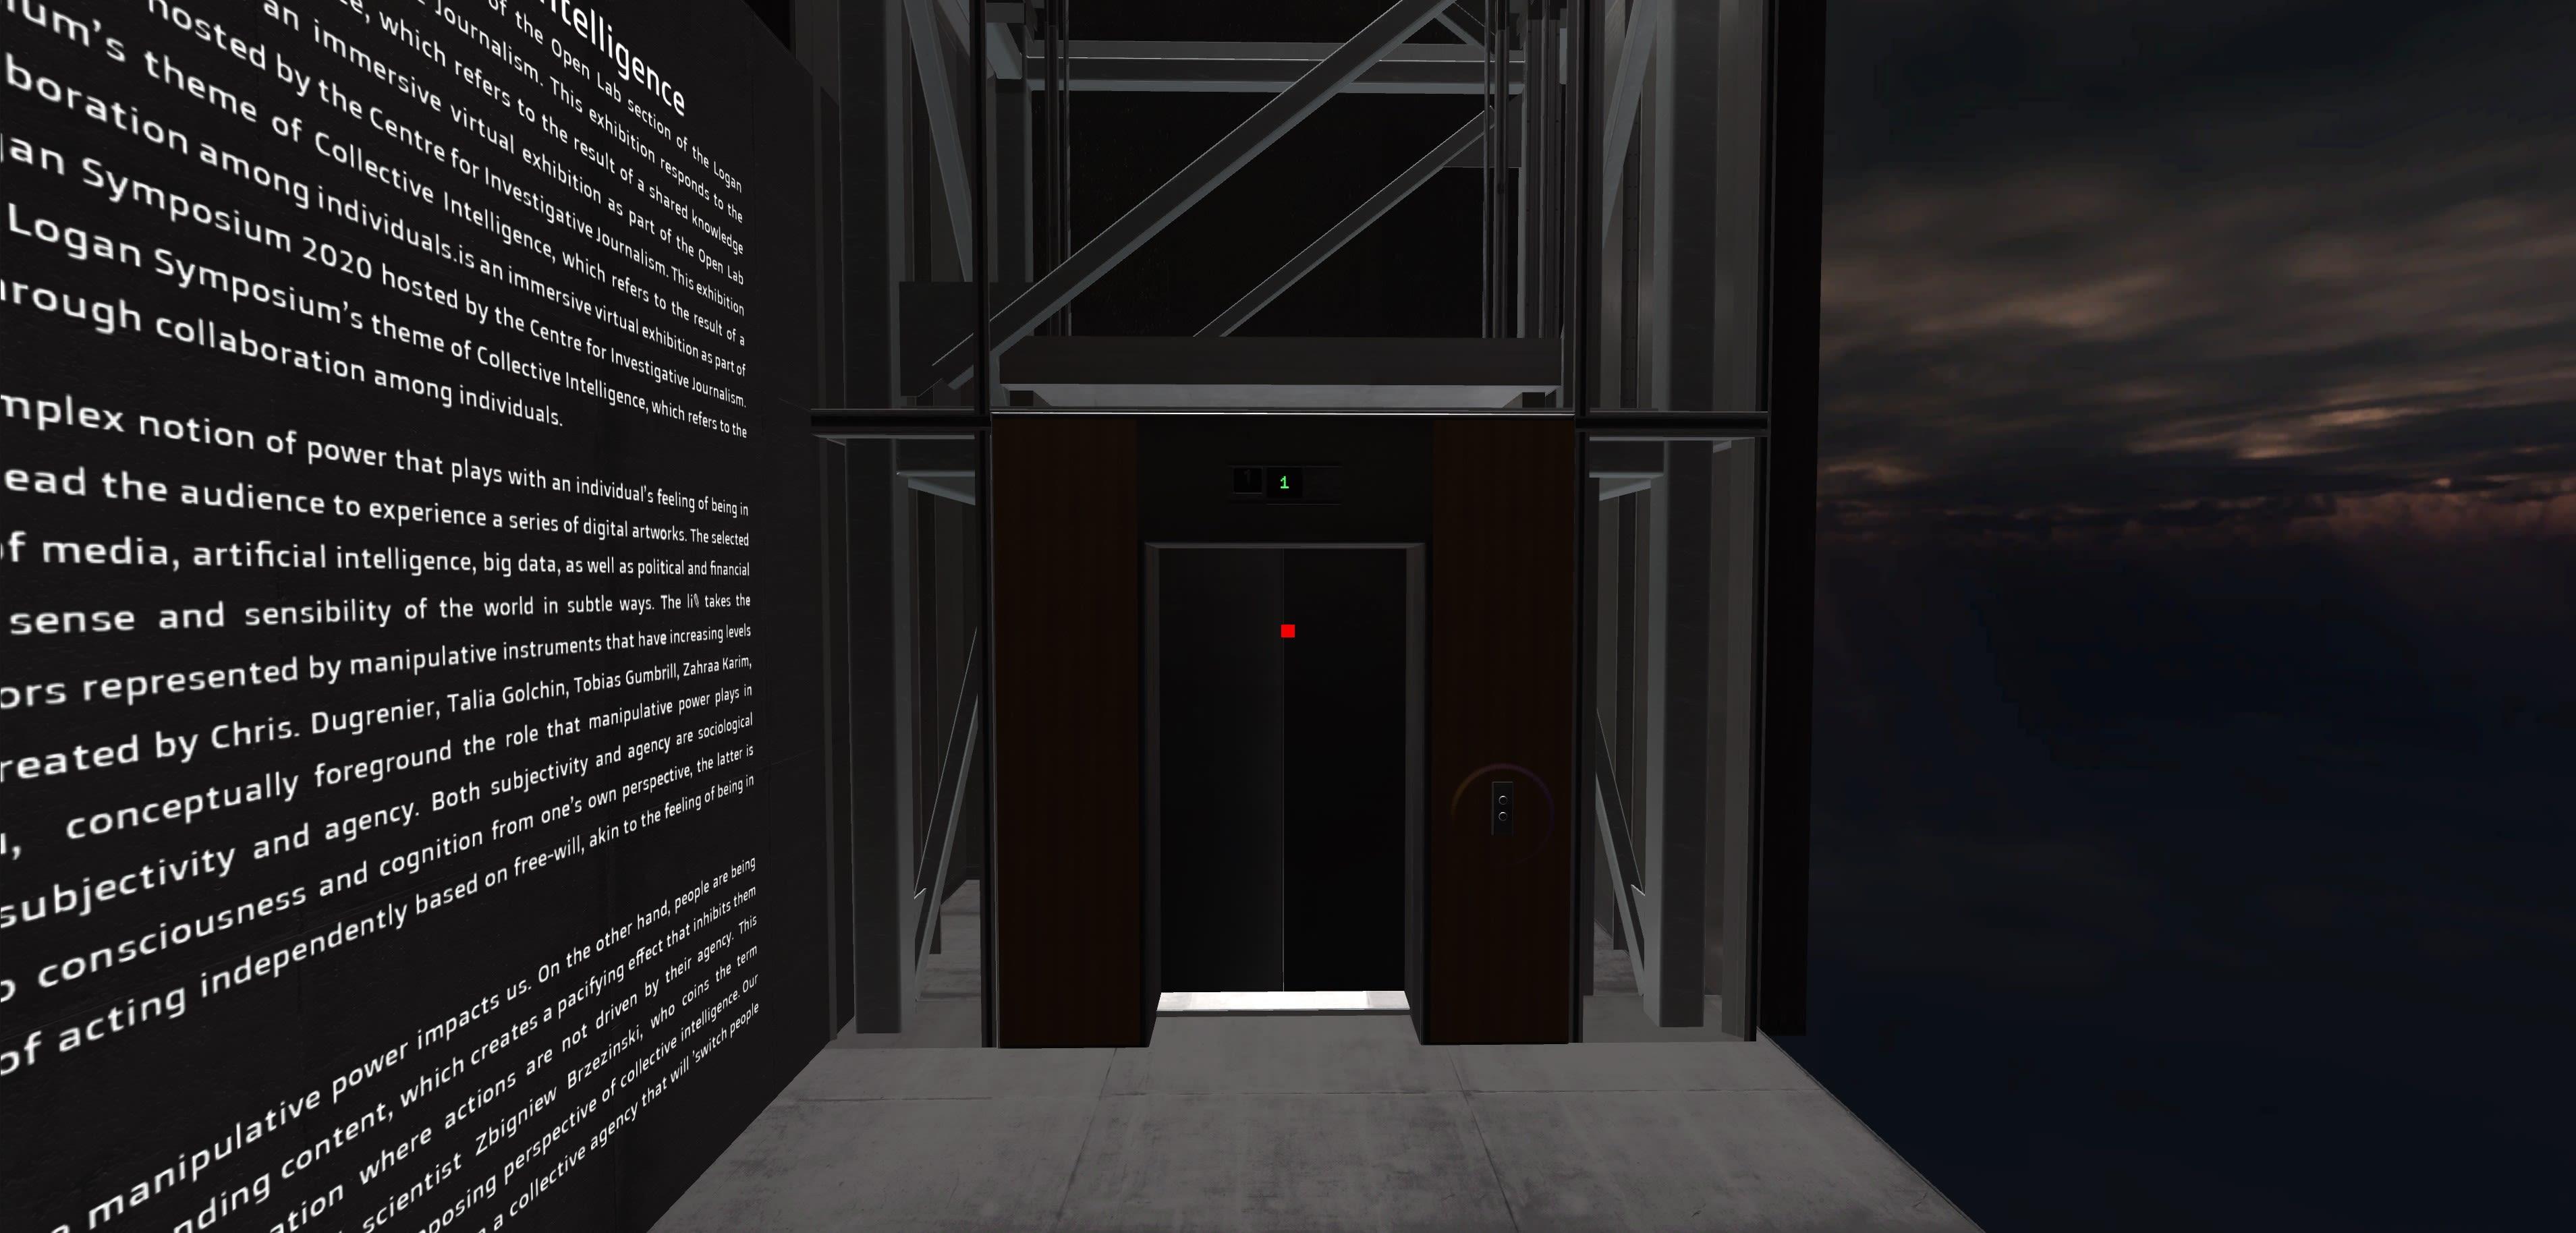 screenshot of virtual exhibition